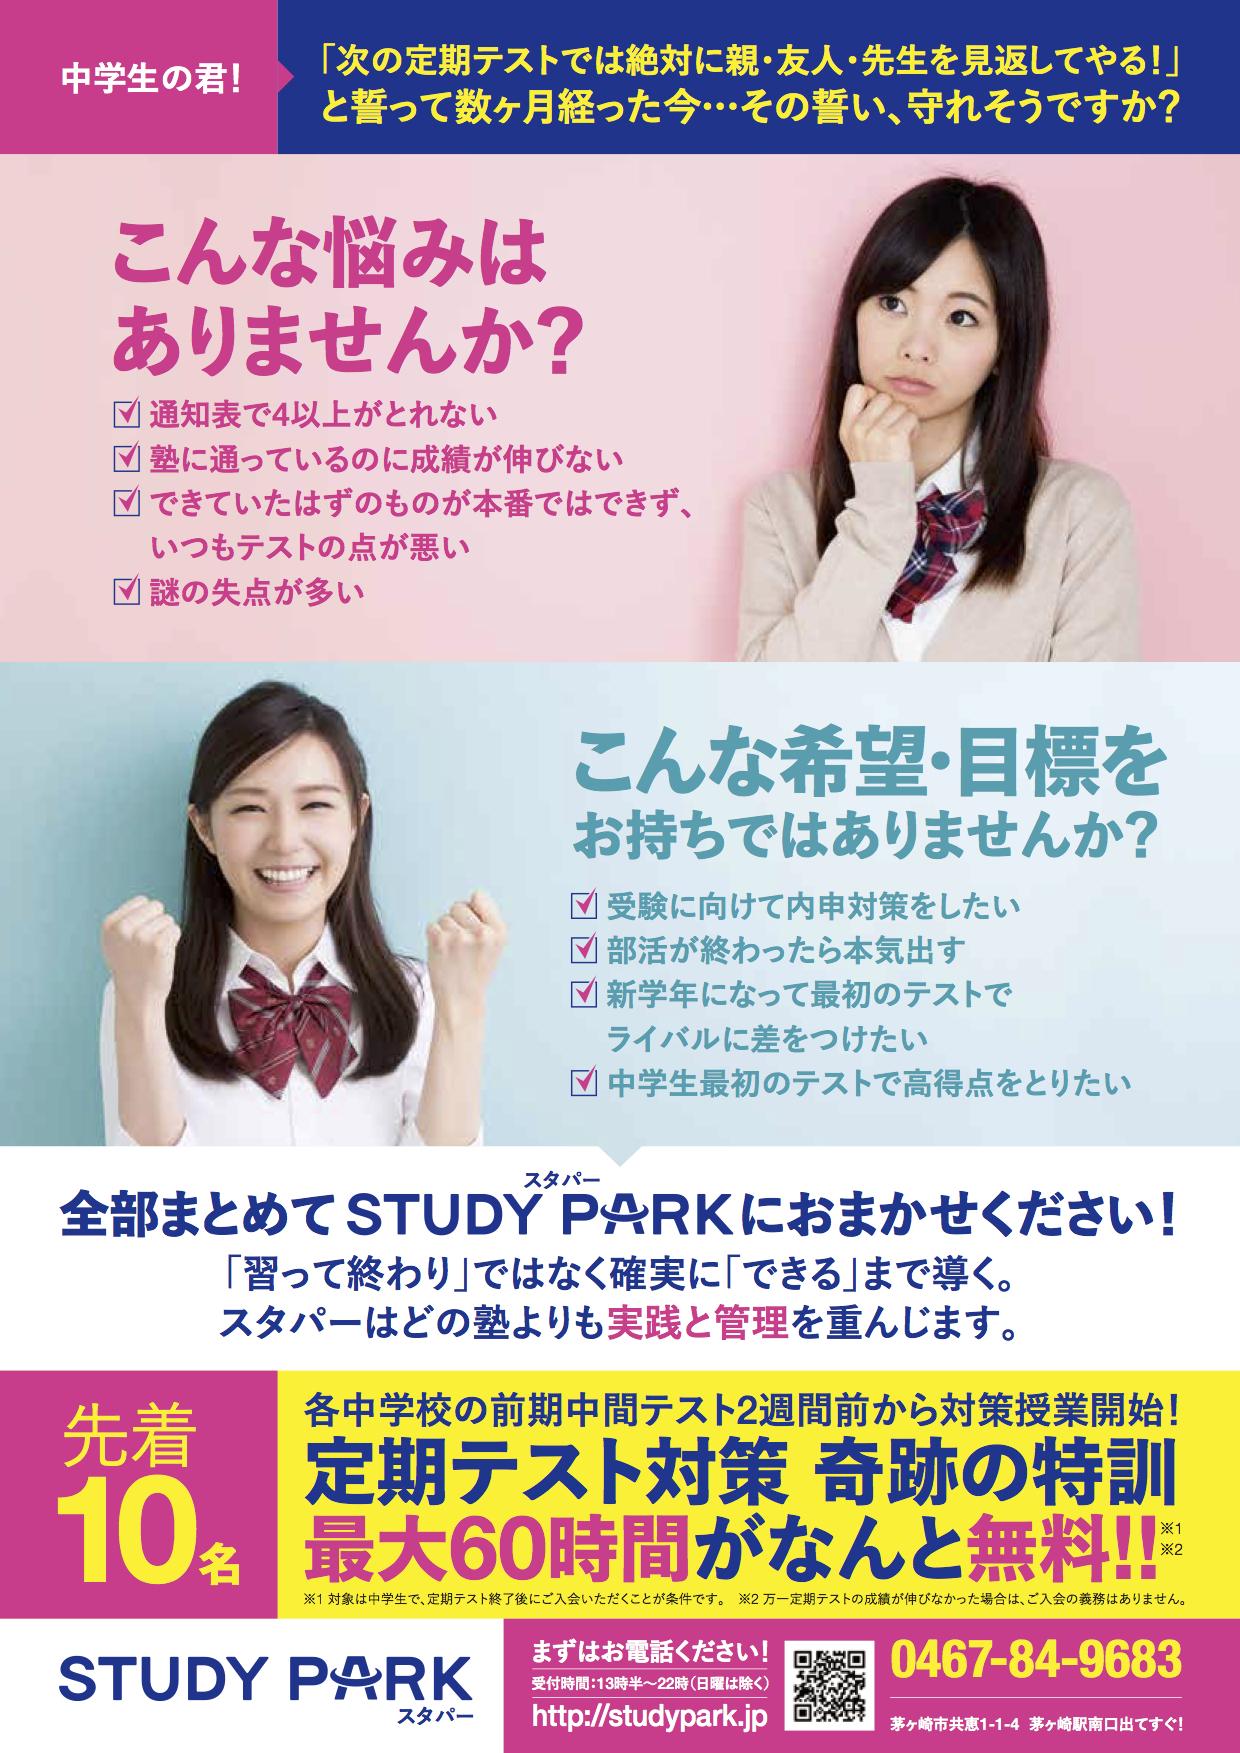 1705_TESTEA_STUDY PARK_A4